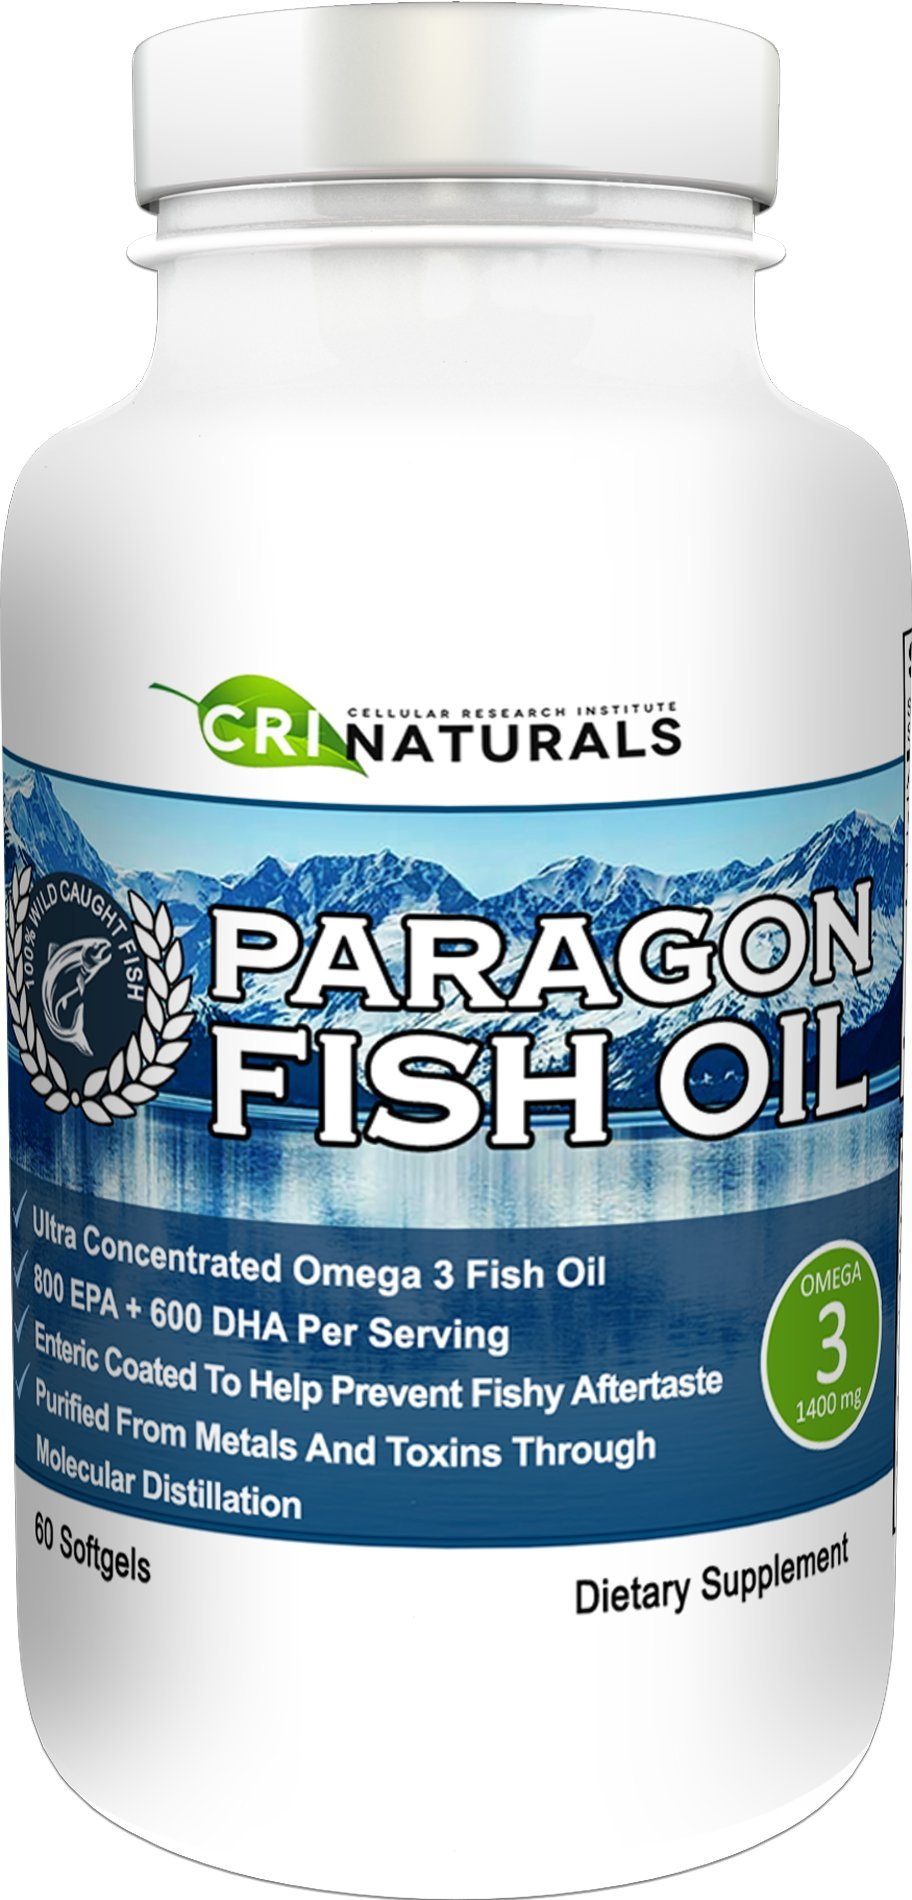 Paragon Fish Oil - Purest - Triple Strength - Omega 3 Fish Oil - Burpless - Highest - EPA + DHA